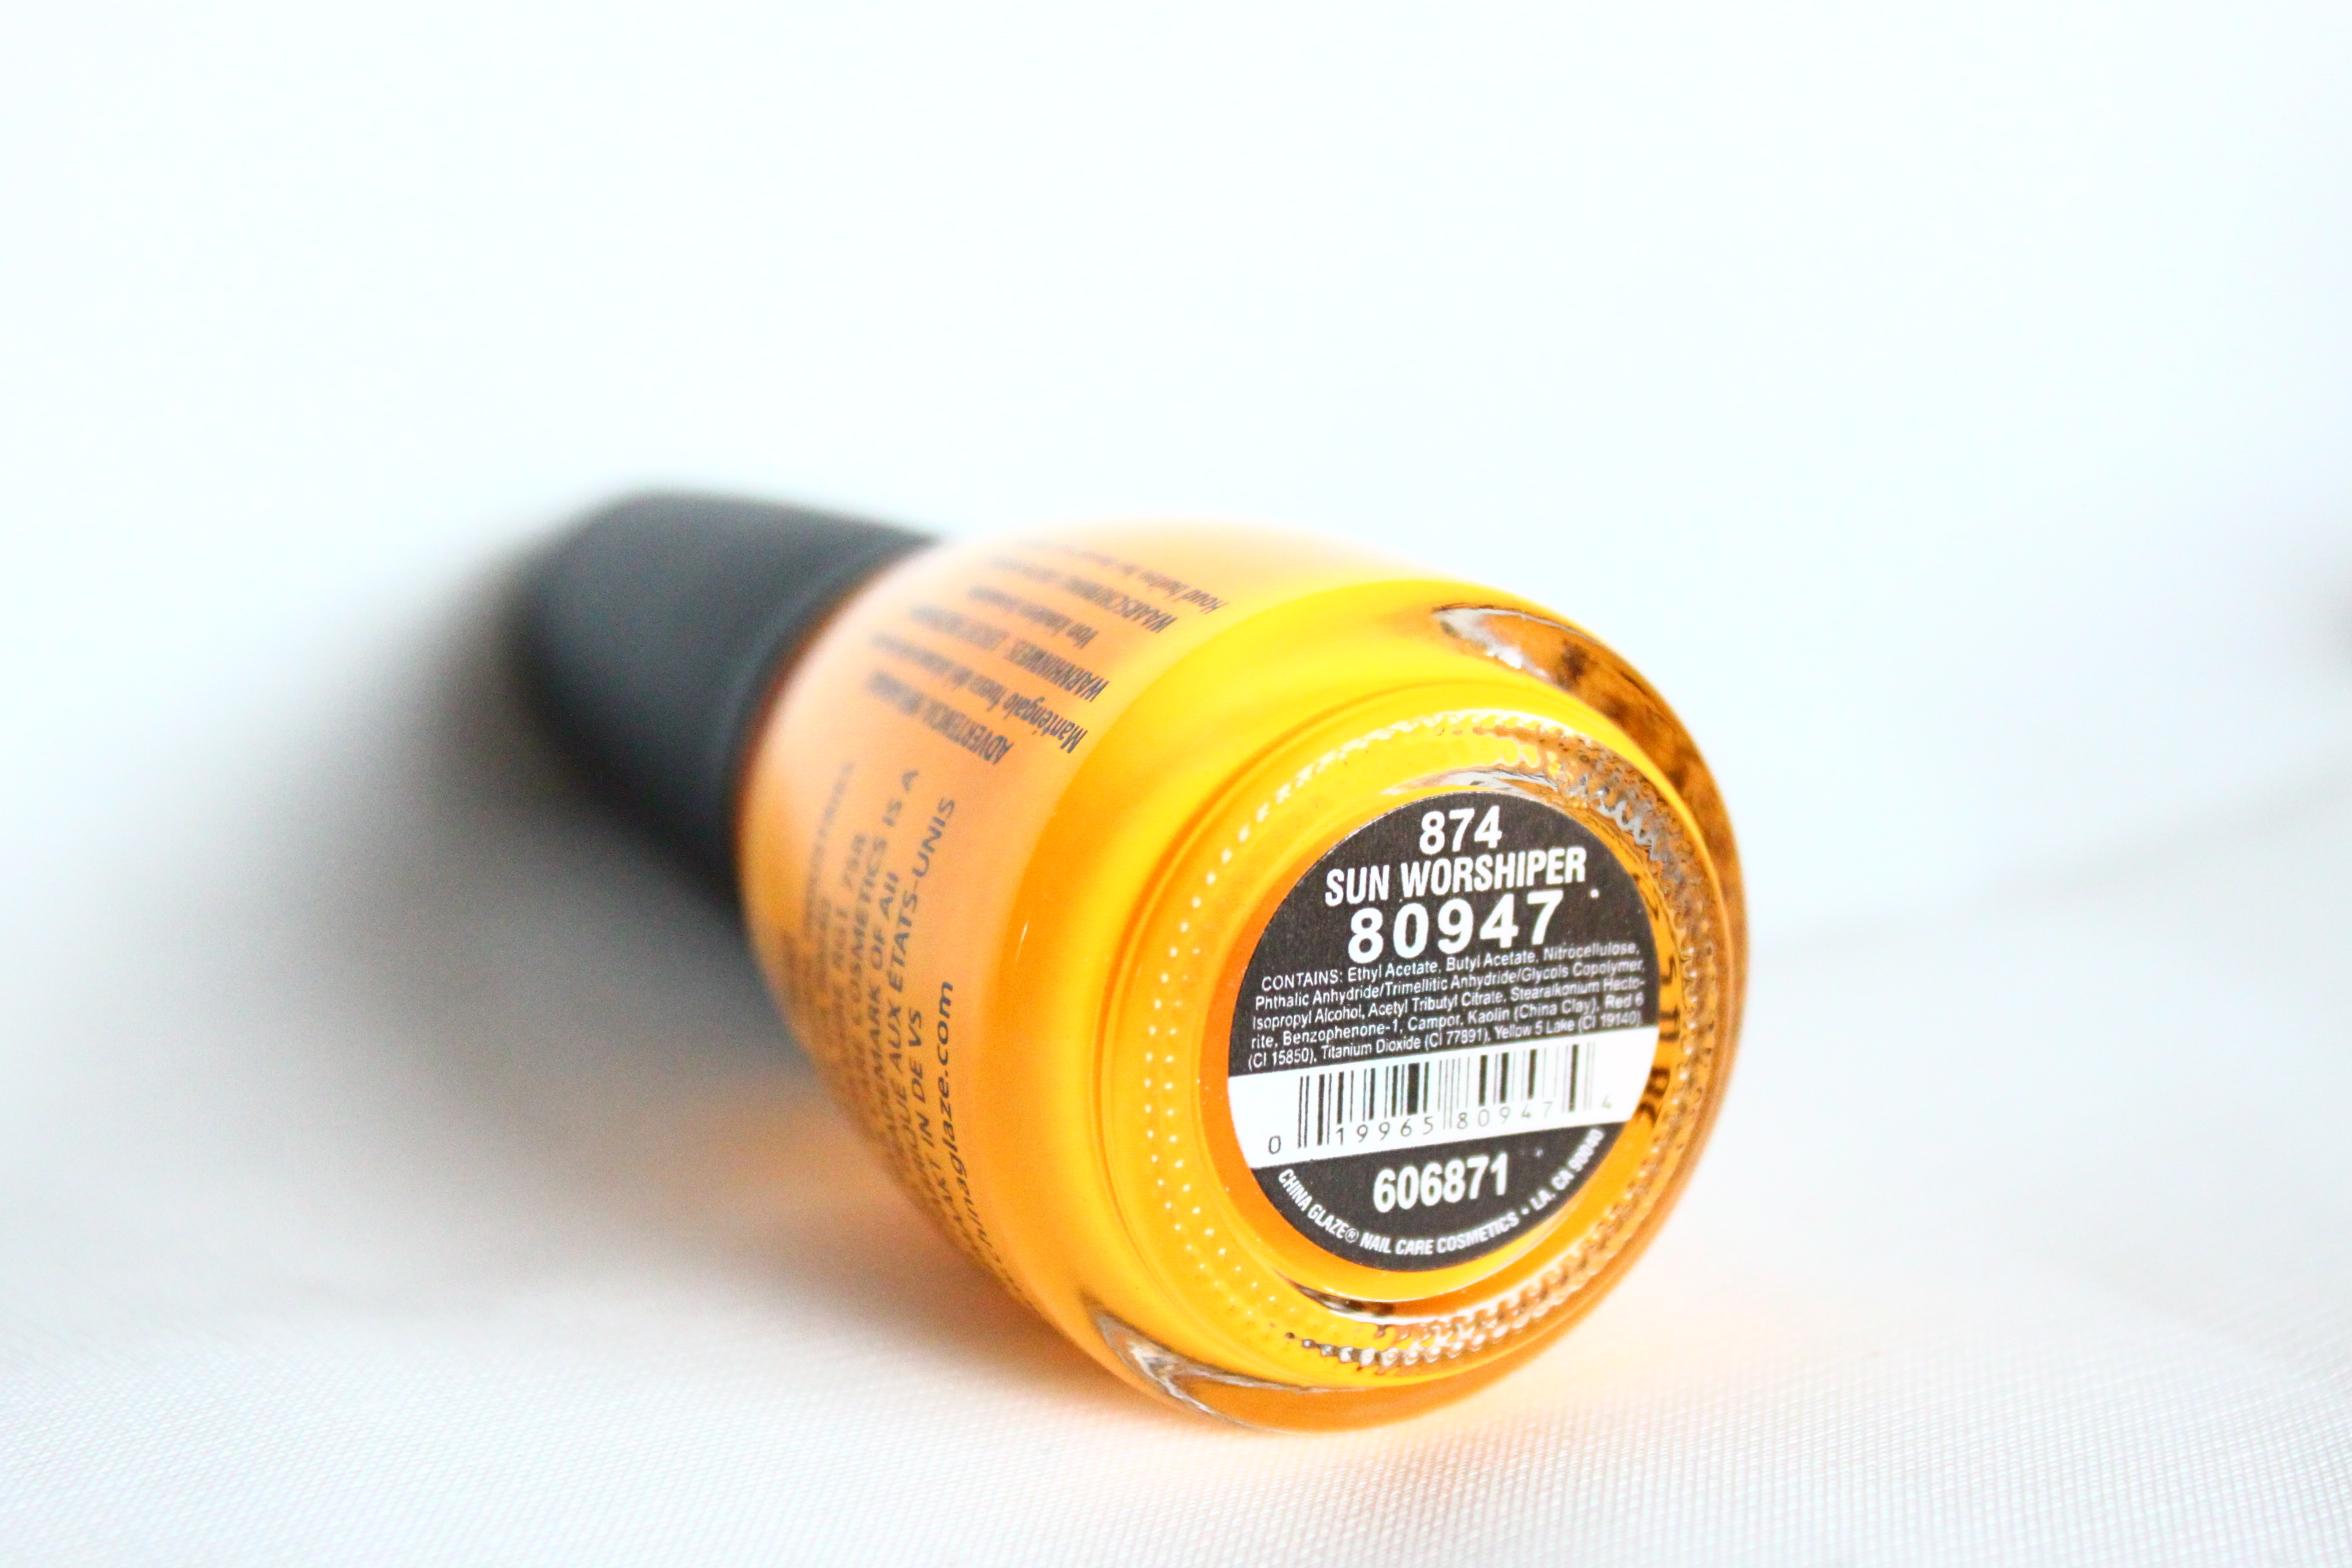 China Glaze Nagellack Nail Lacquer Polish 874 Sun Worshiper Gelb yellow